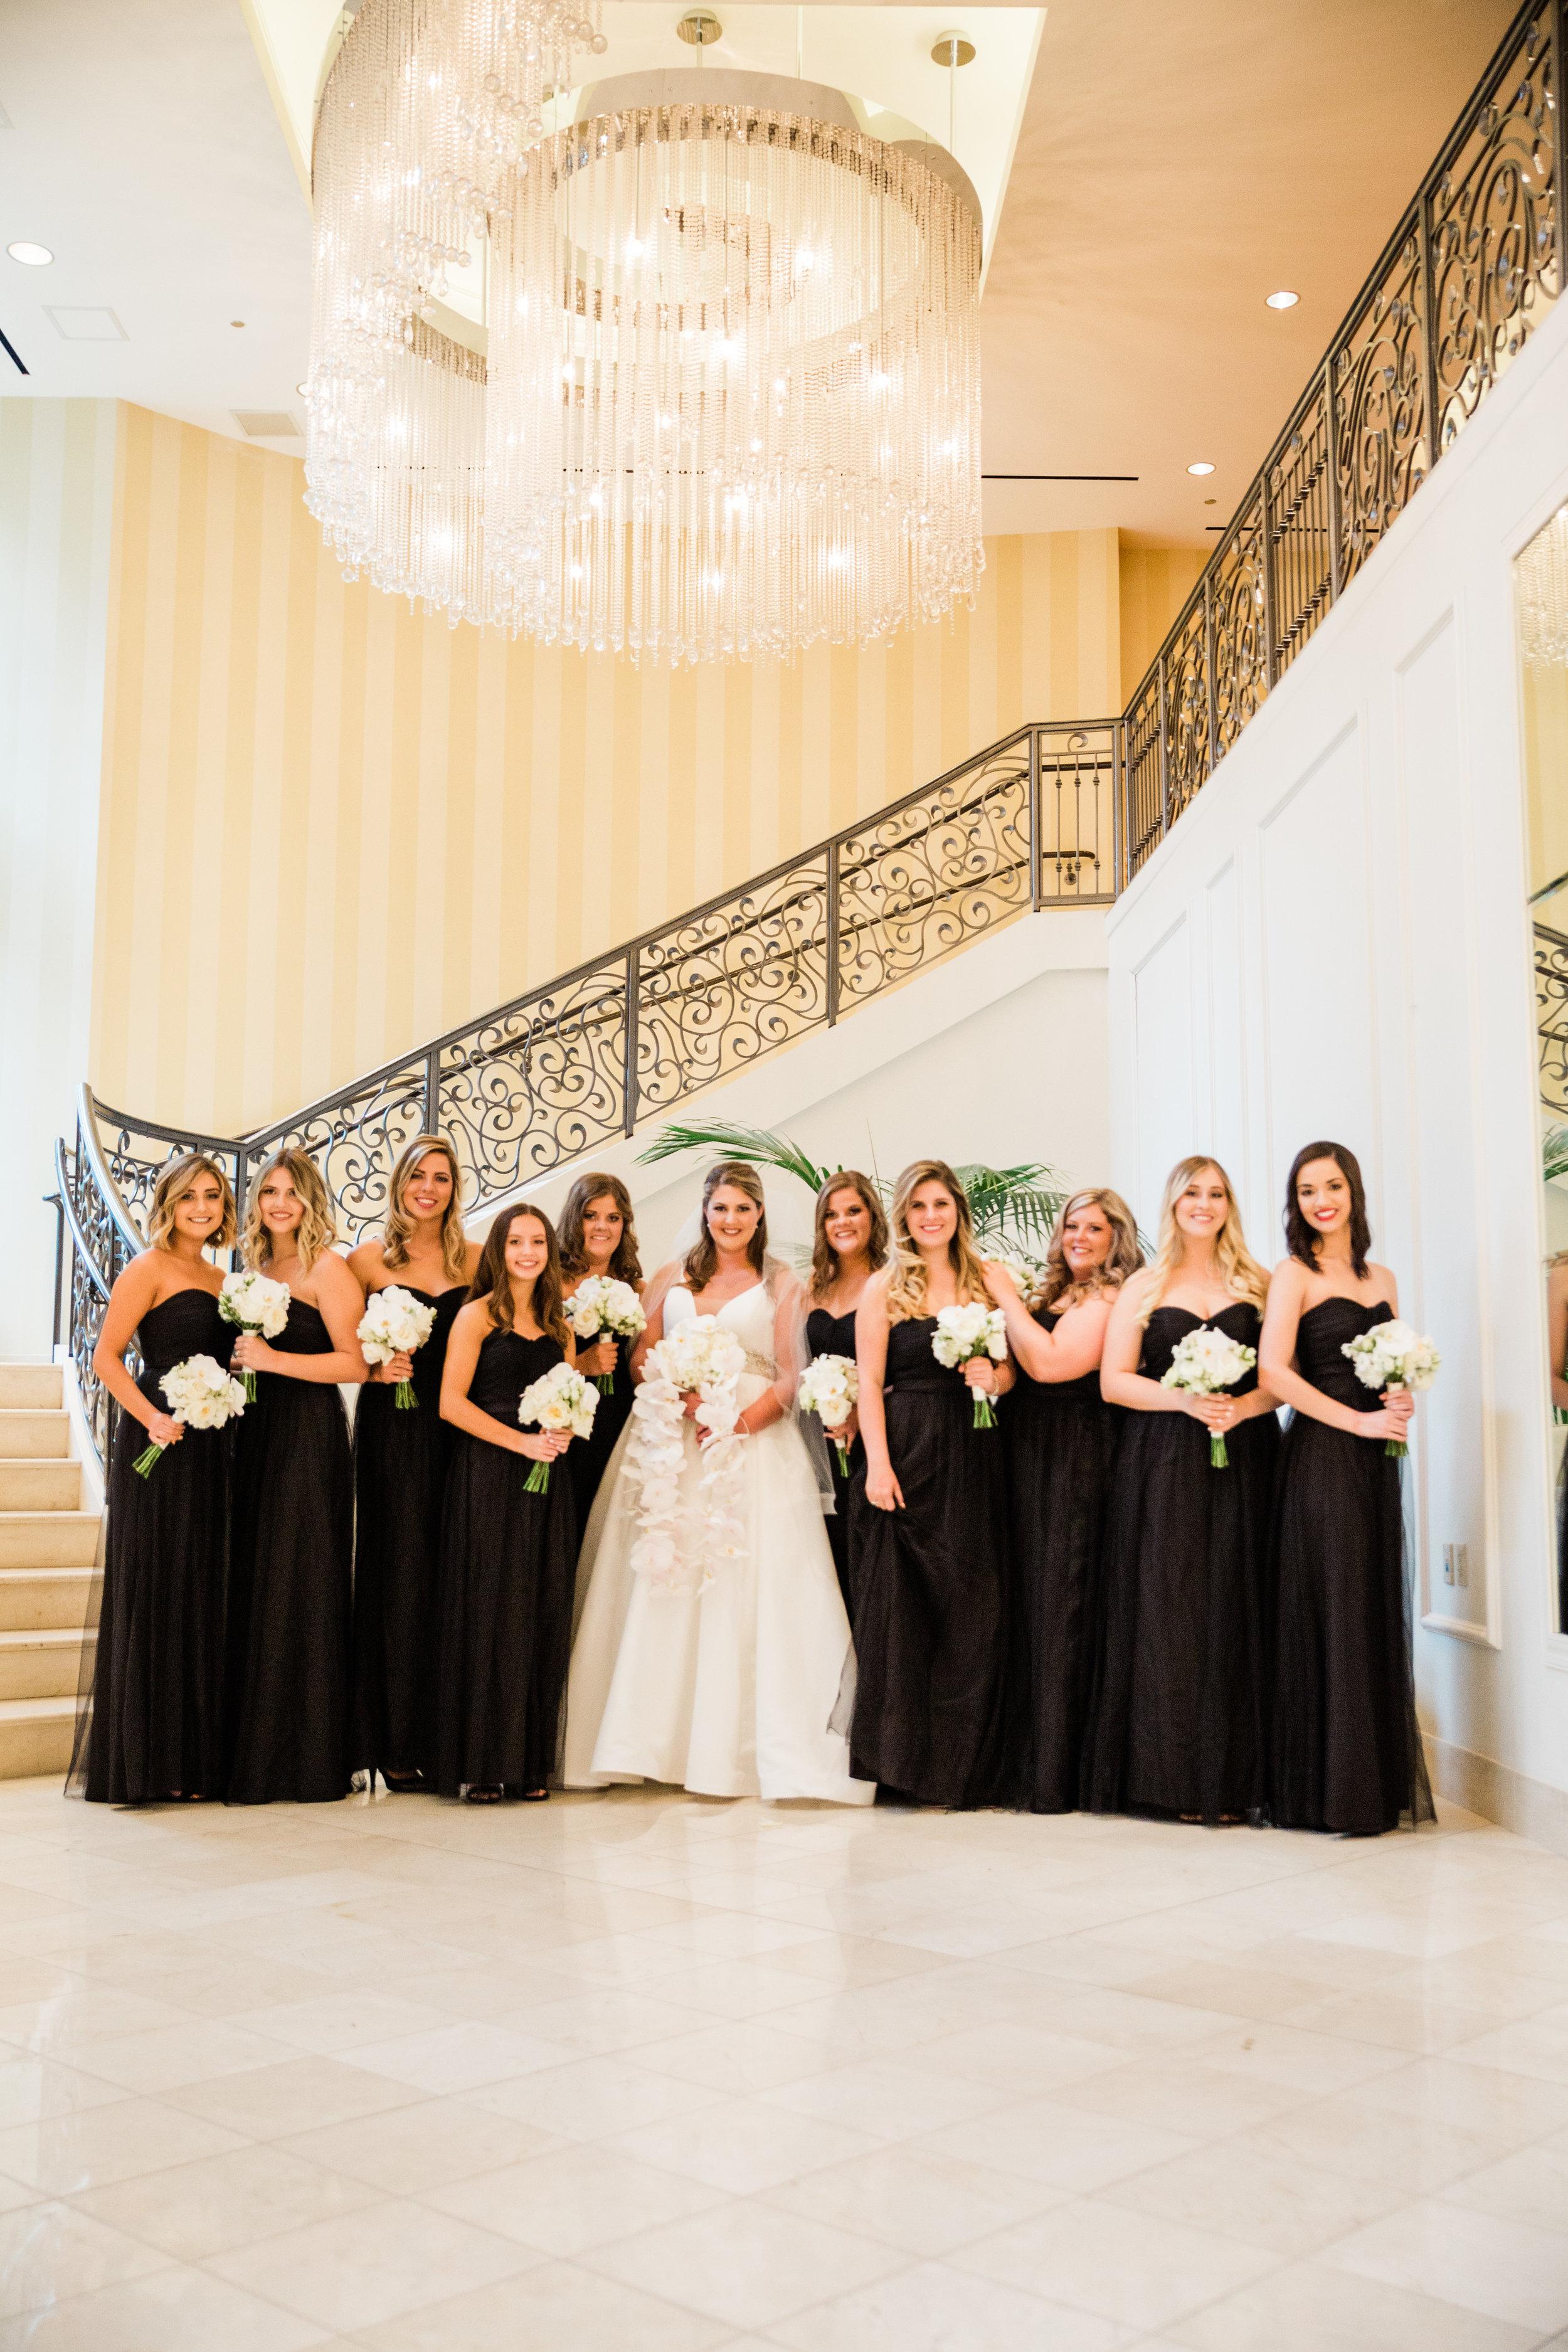 BridalPartyPortraits-103.jpg